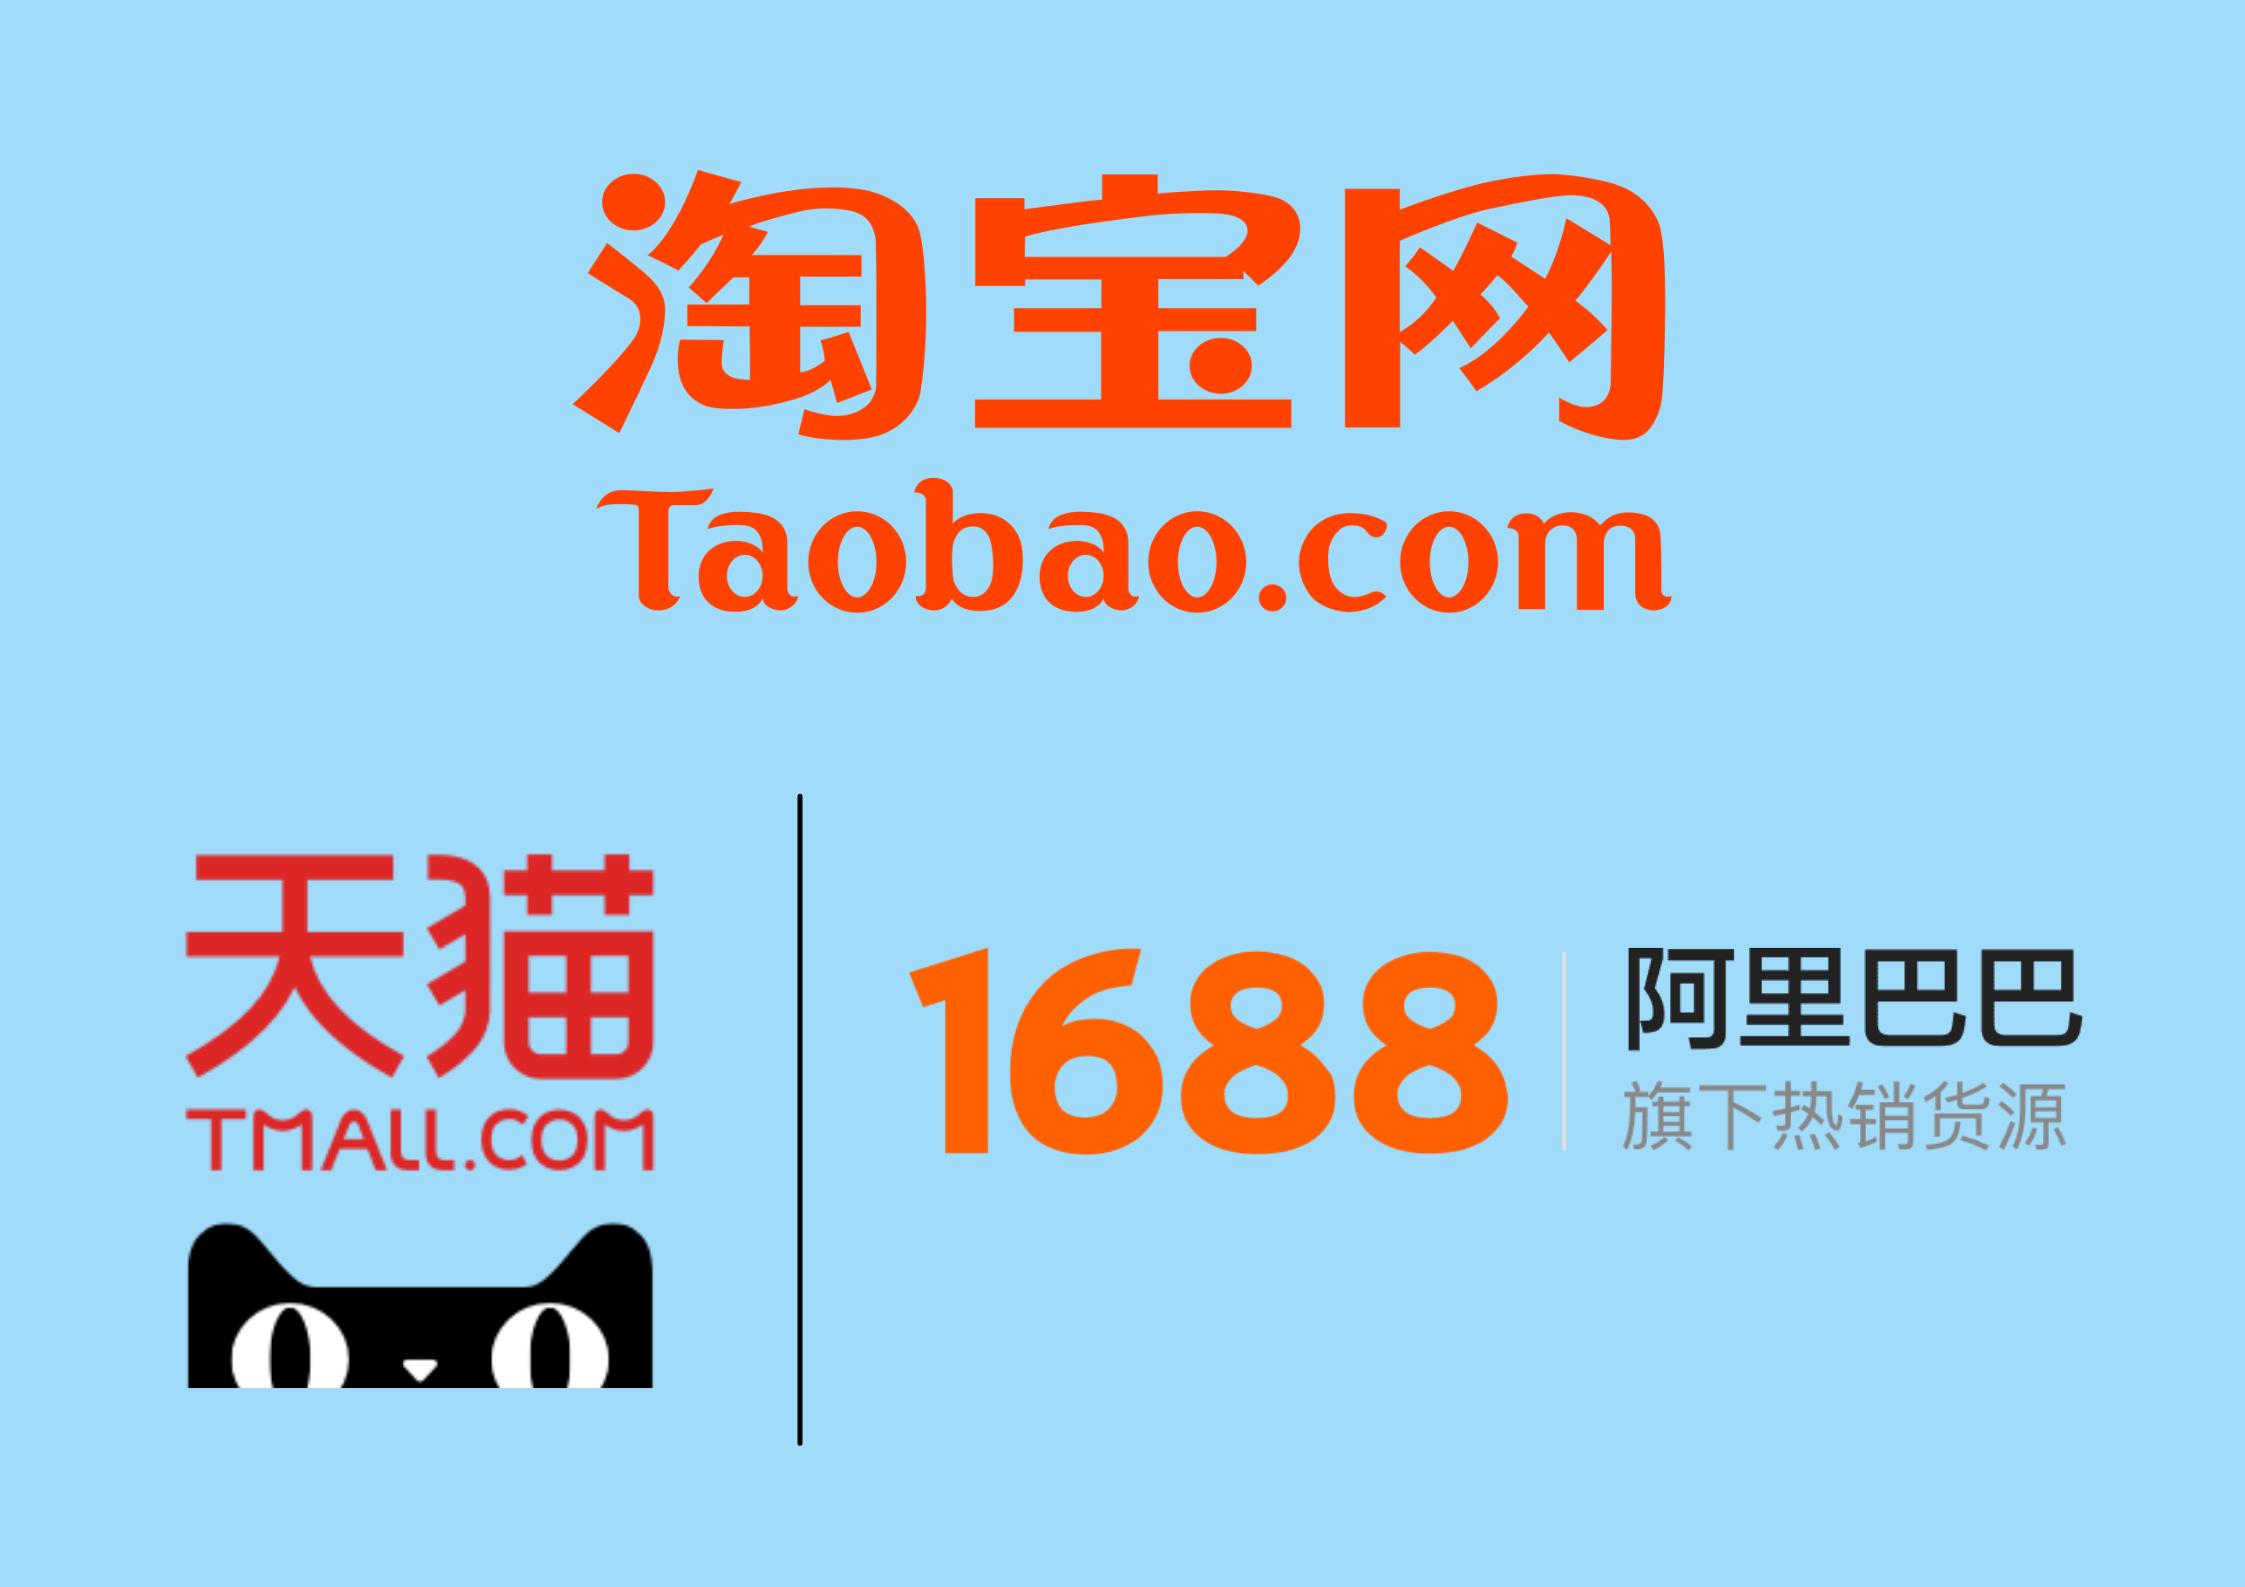 LOGO TAOBAO TMALL 1688